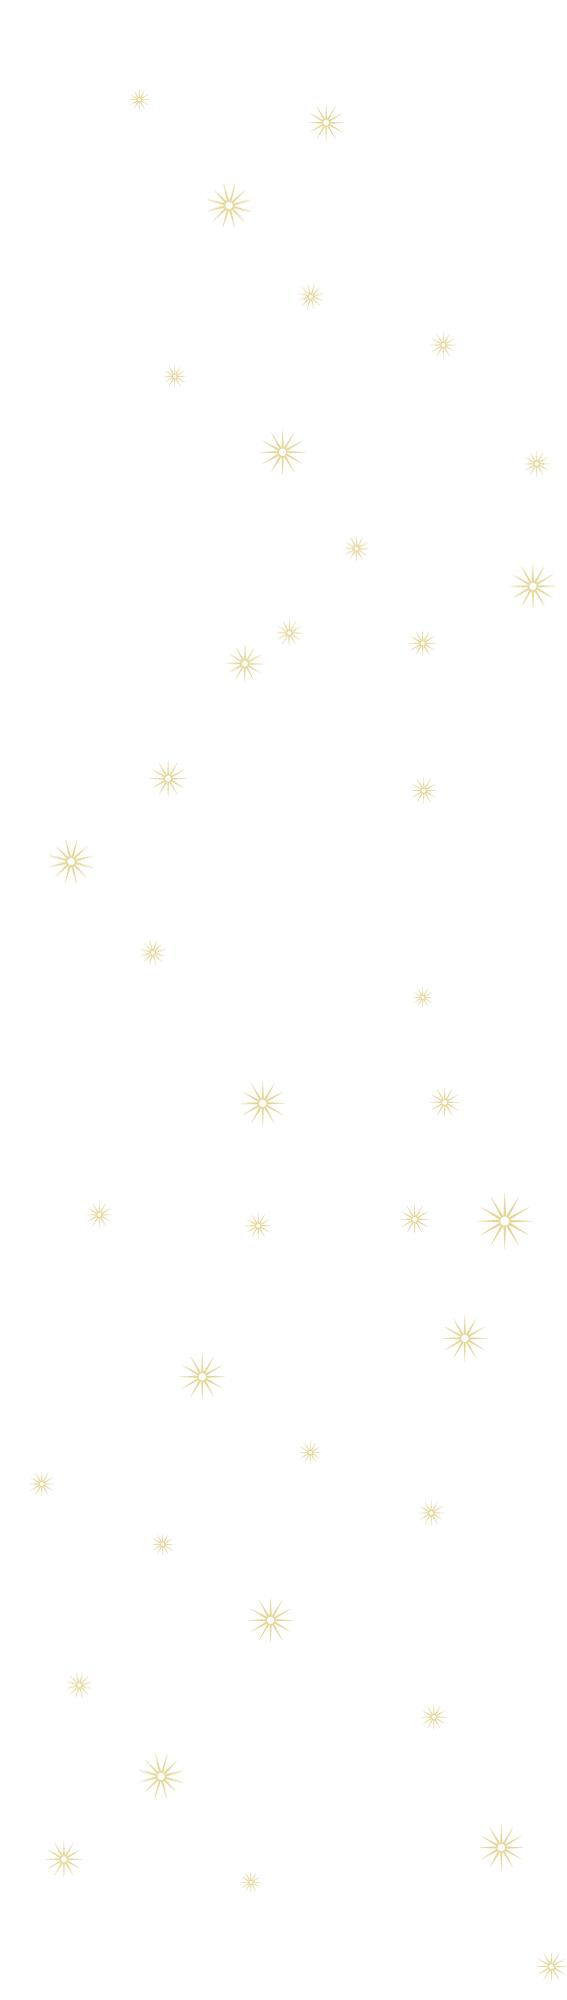 sidebar-stars.png